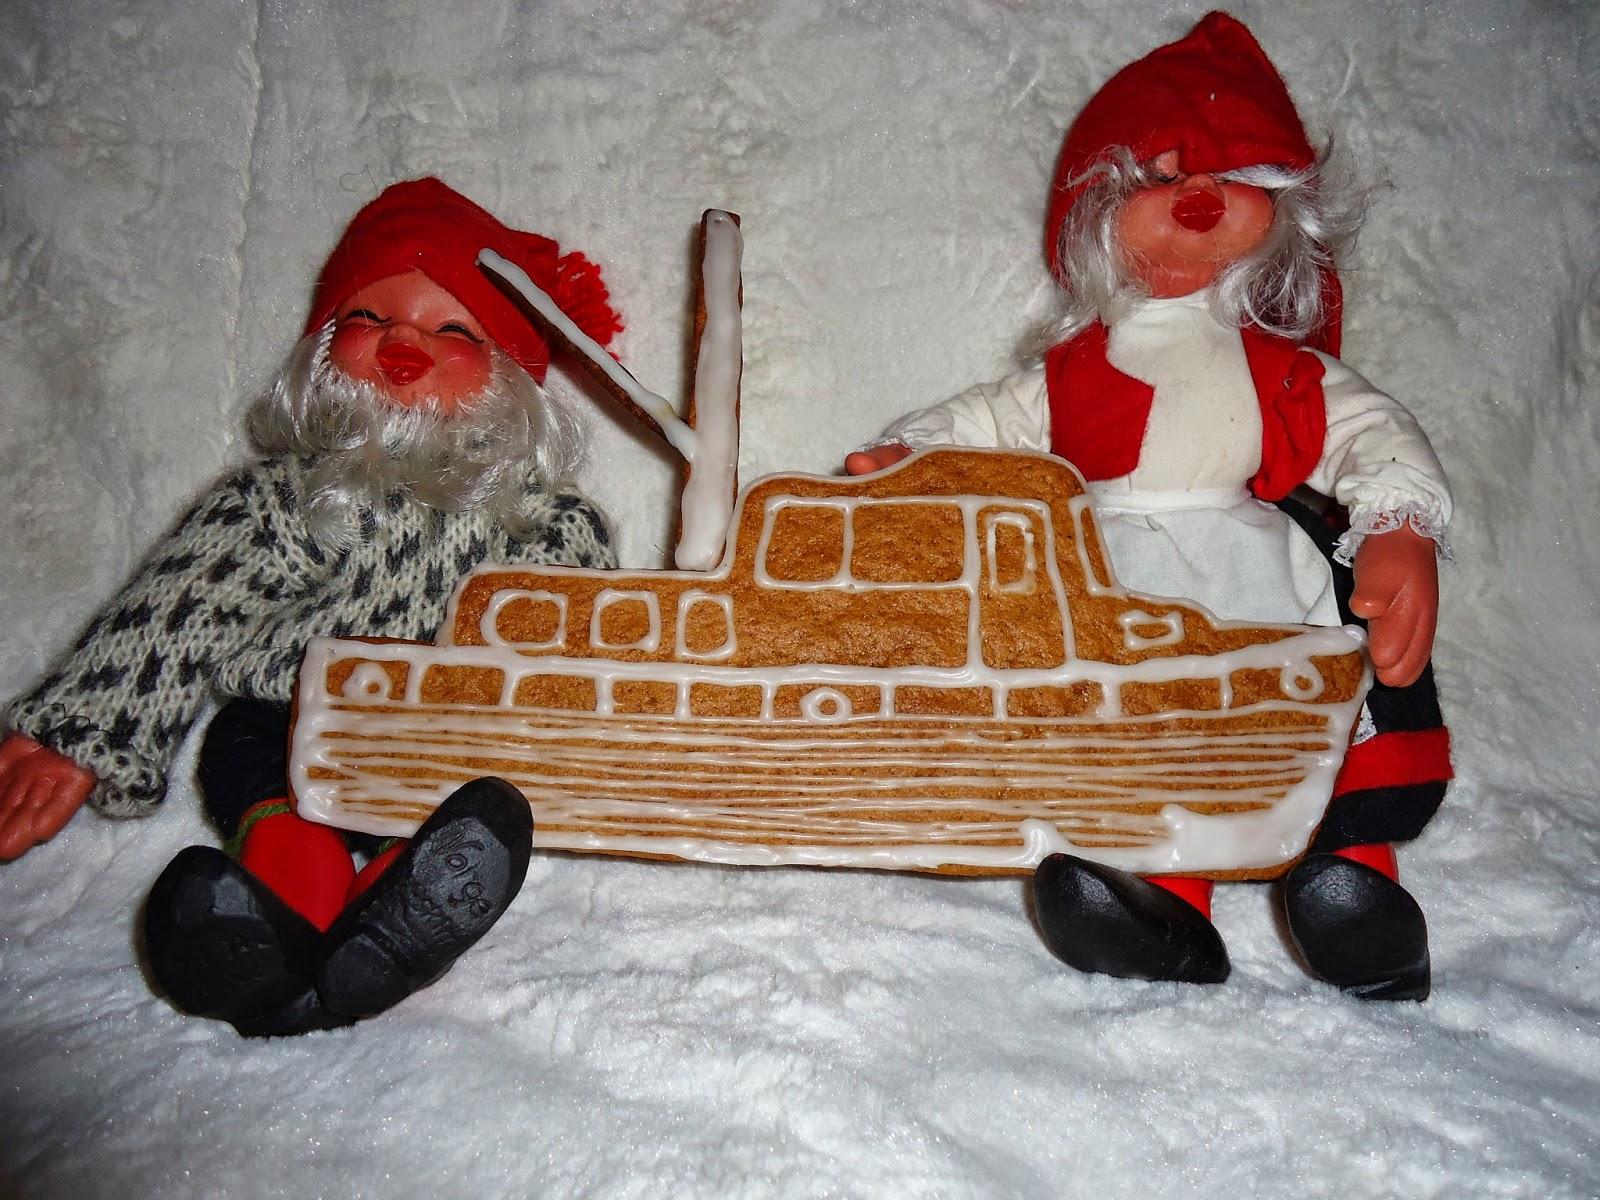 Trawler, pepperkake båt, trawler gingerbread